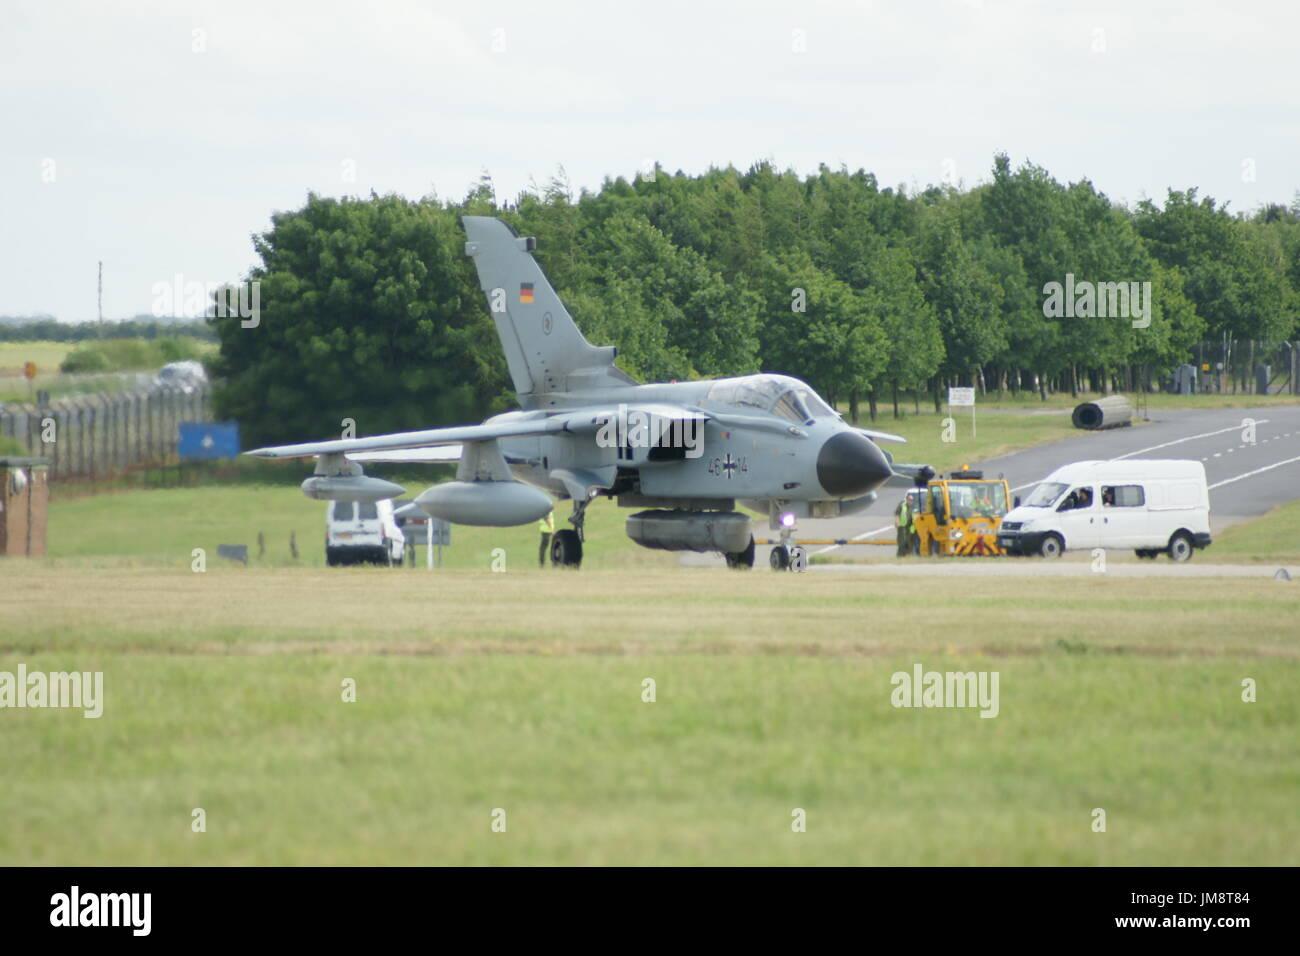 Panavia Tornado GR4 - Stock Image